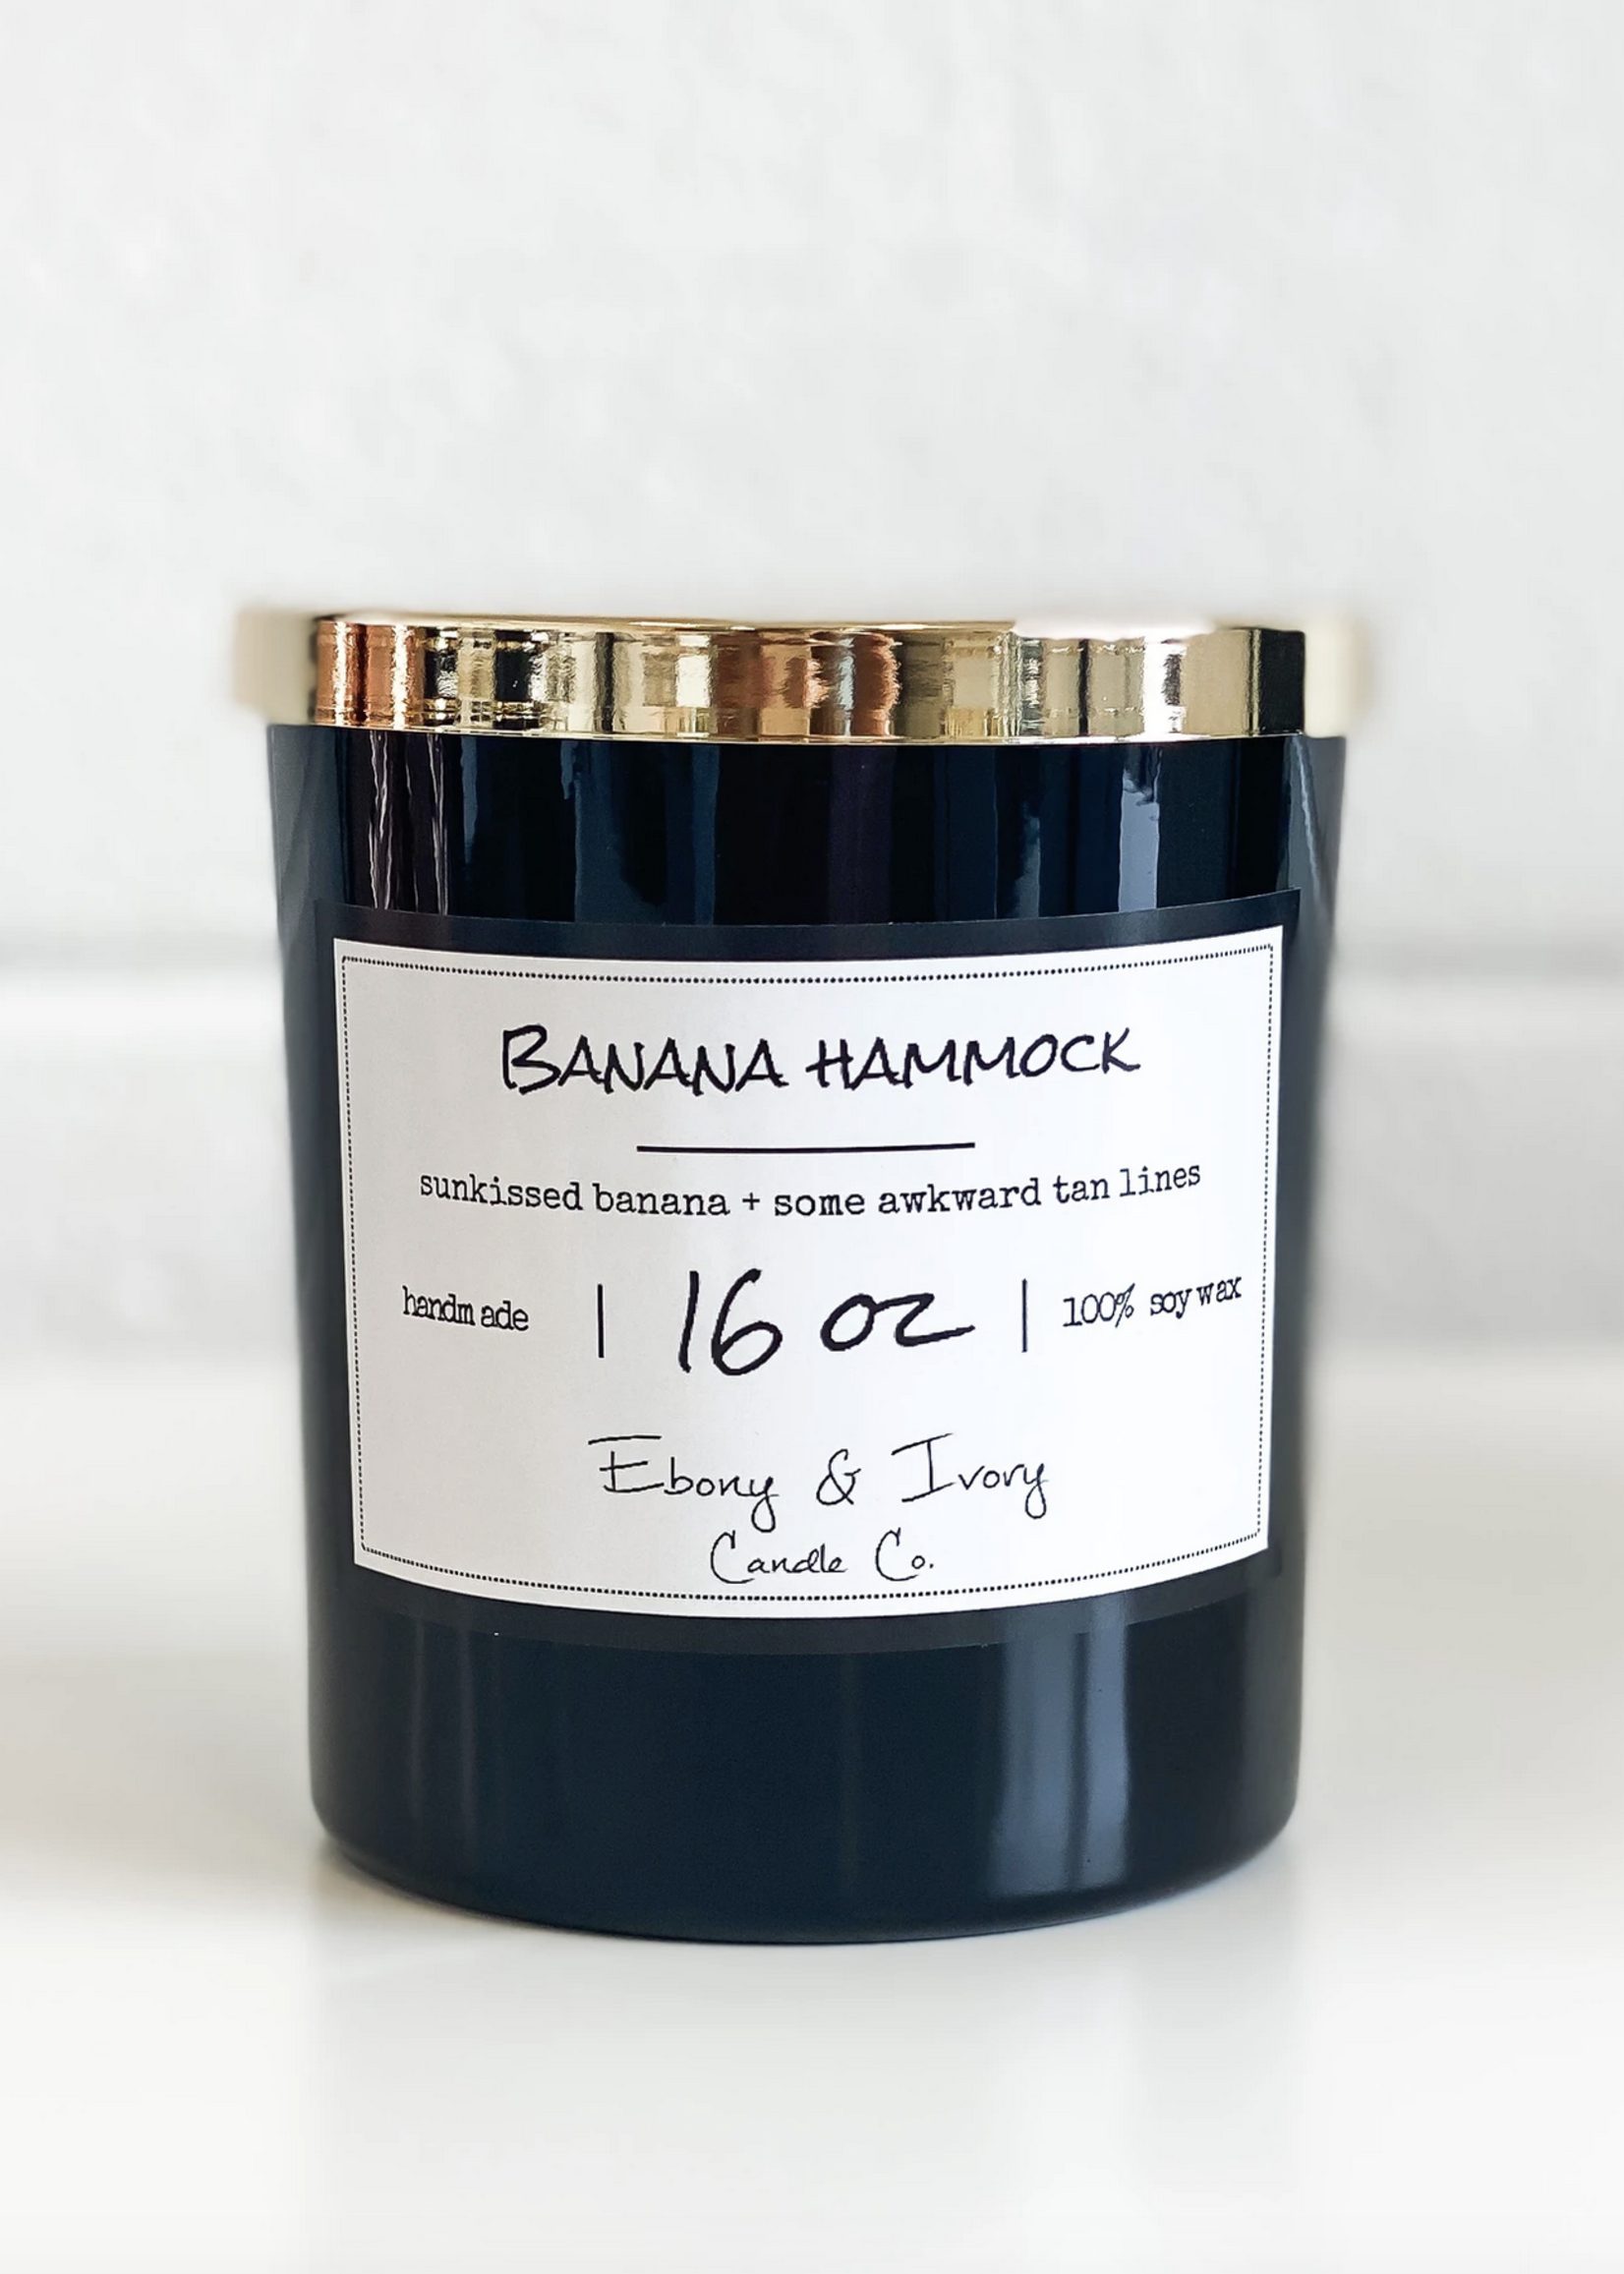 Ebony & Ivory Candle Co. Banana Hammock 16oz